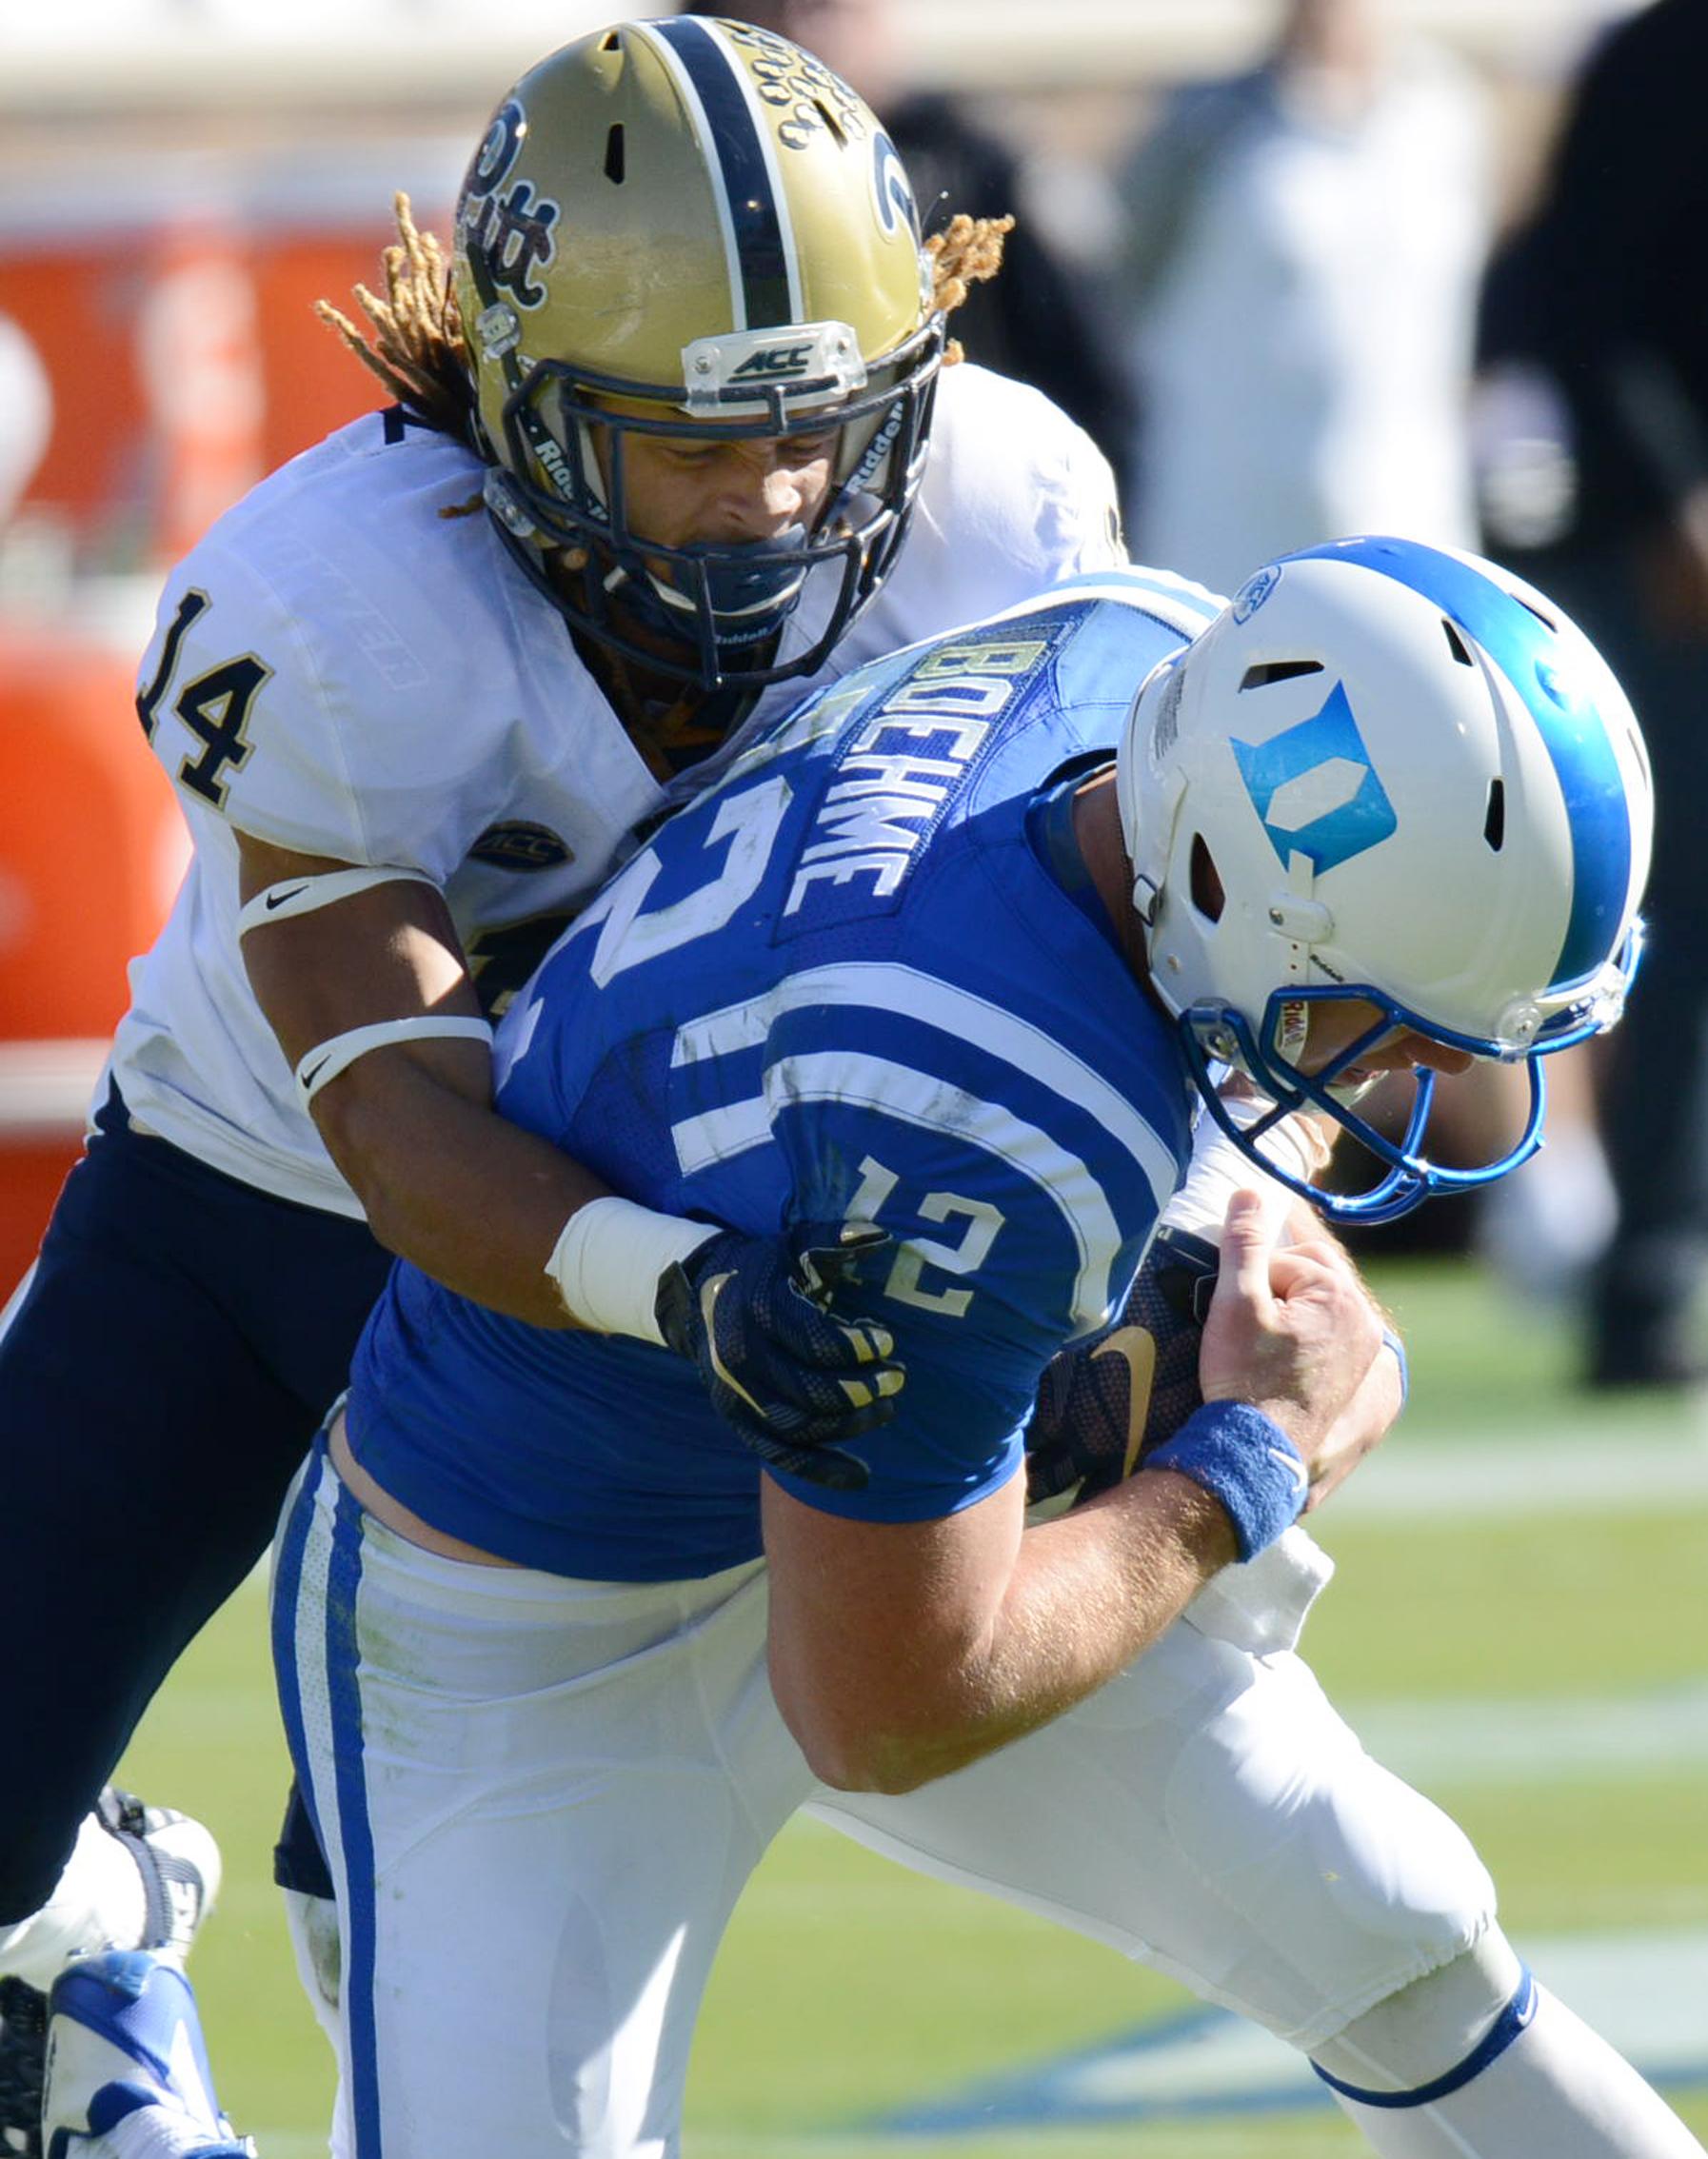 Duke quarterback Parker Boehme (12) is tackled by Pittsburgh's Avonte Maddox (14) during an NCAA college football game Saturday, Nov. 14, 2015, in Durham, N.C. (Bernard Thomas/The Herald-Sun via AP) MANDATORY CREDIT